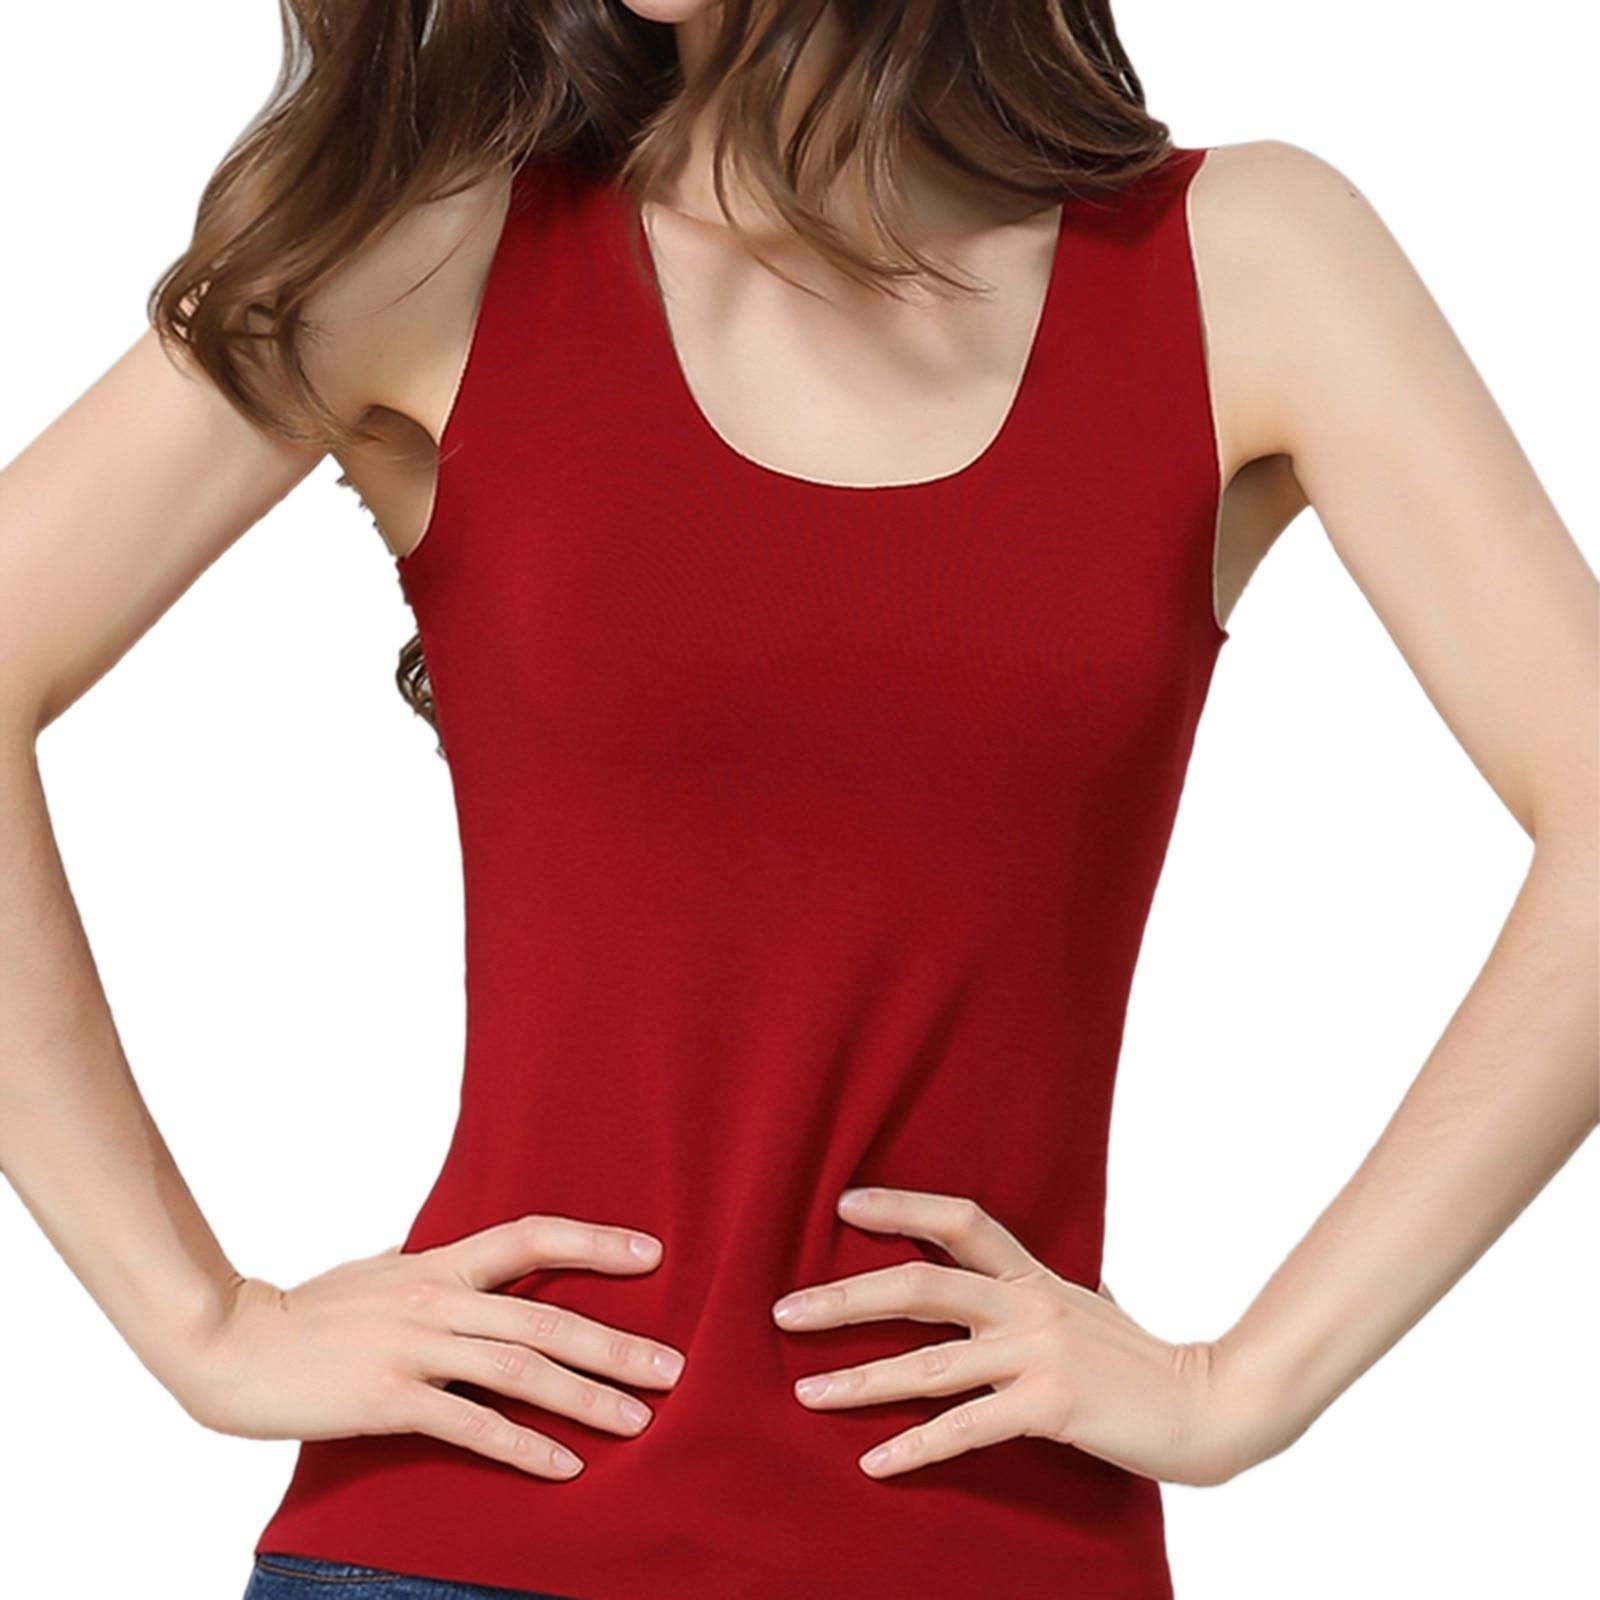 Women Autumn And Winter Velvet Seamless Seamless Seamless Warm Vest Plus Size Heating Underwear Solid Color Heating Underwear